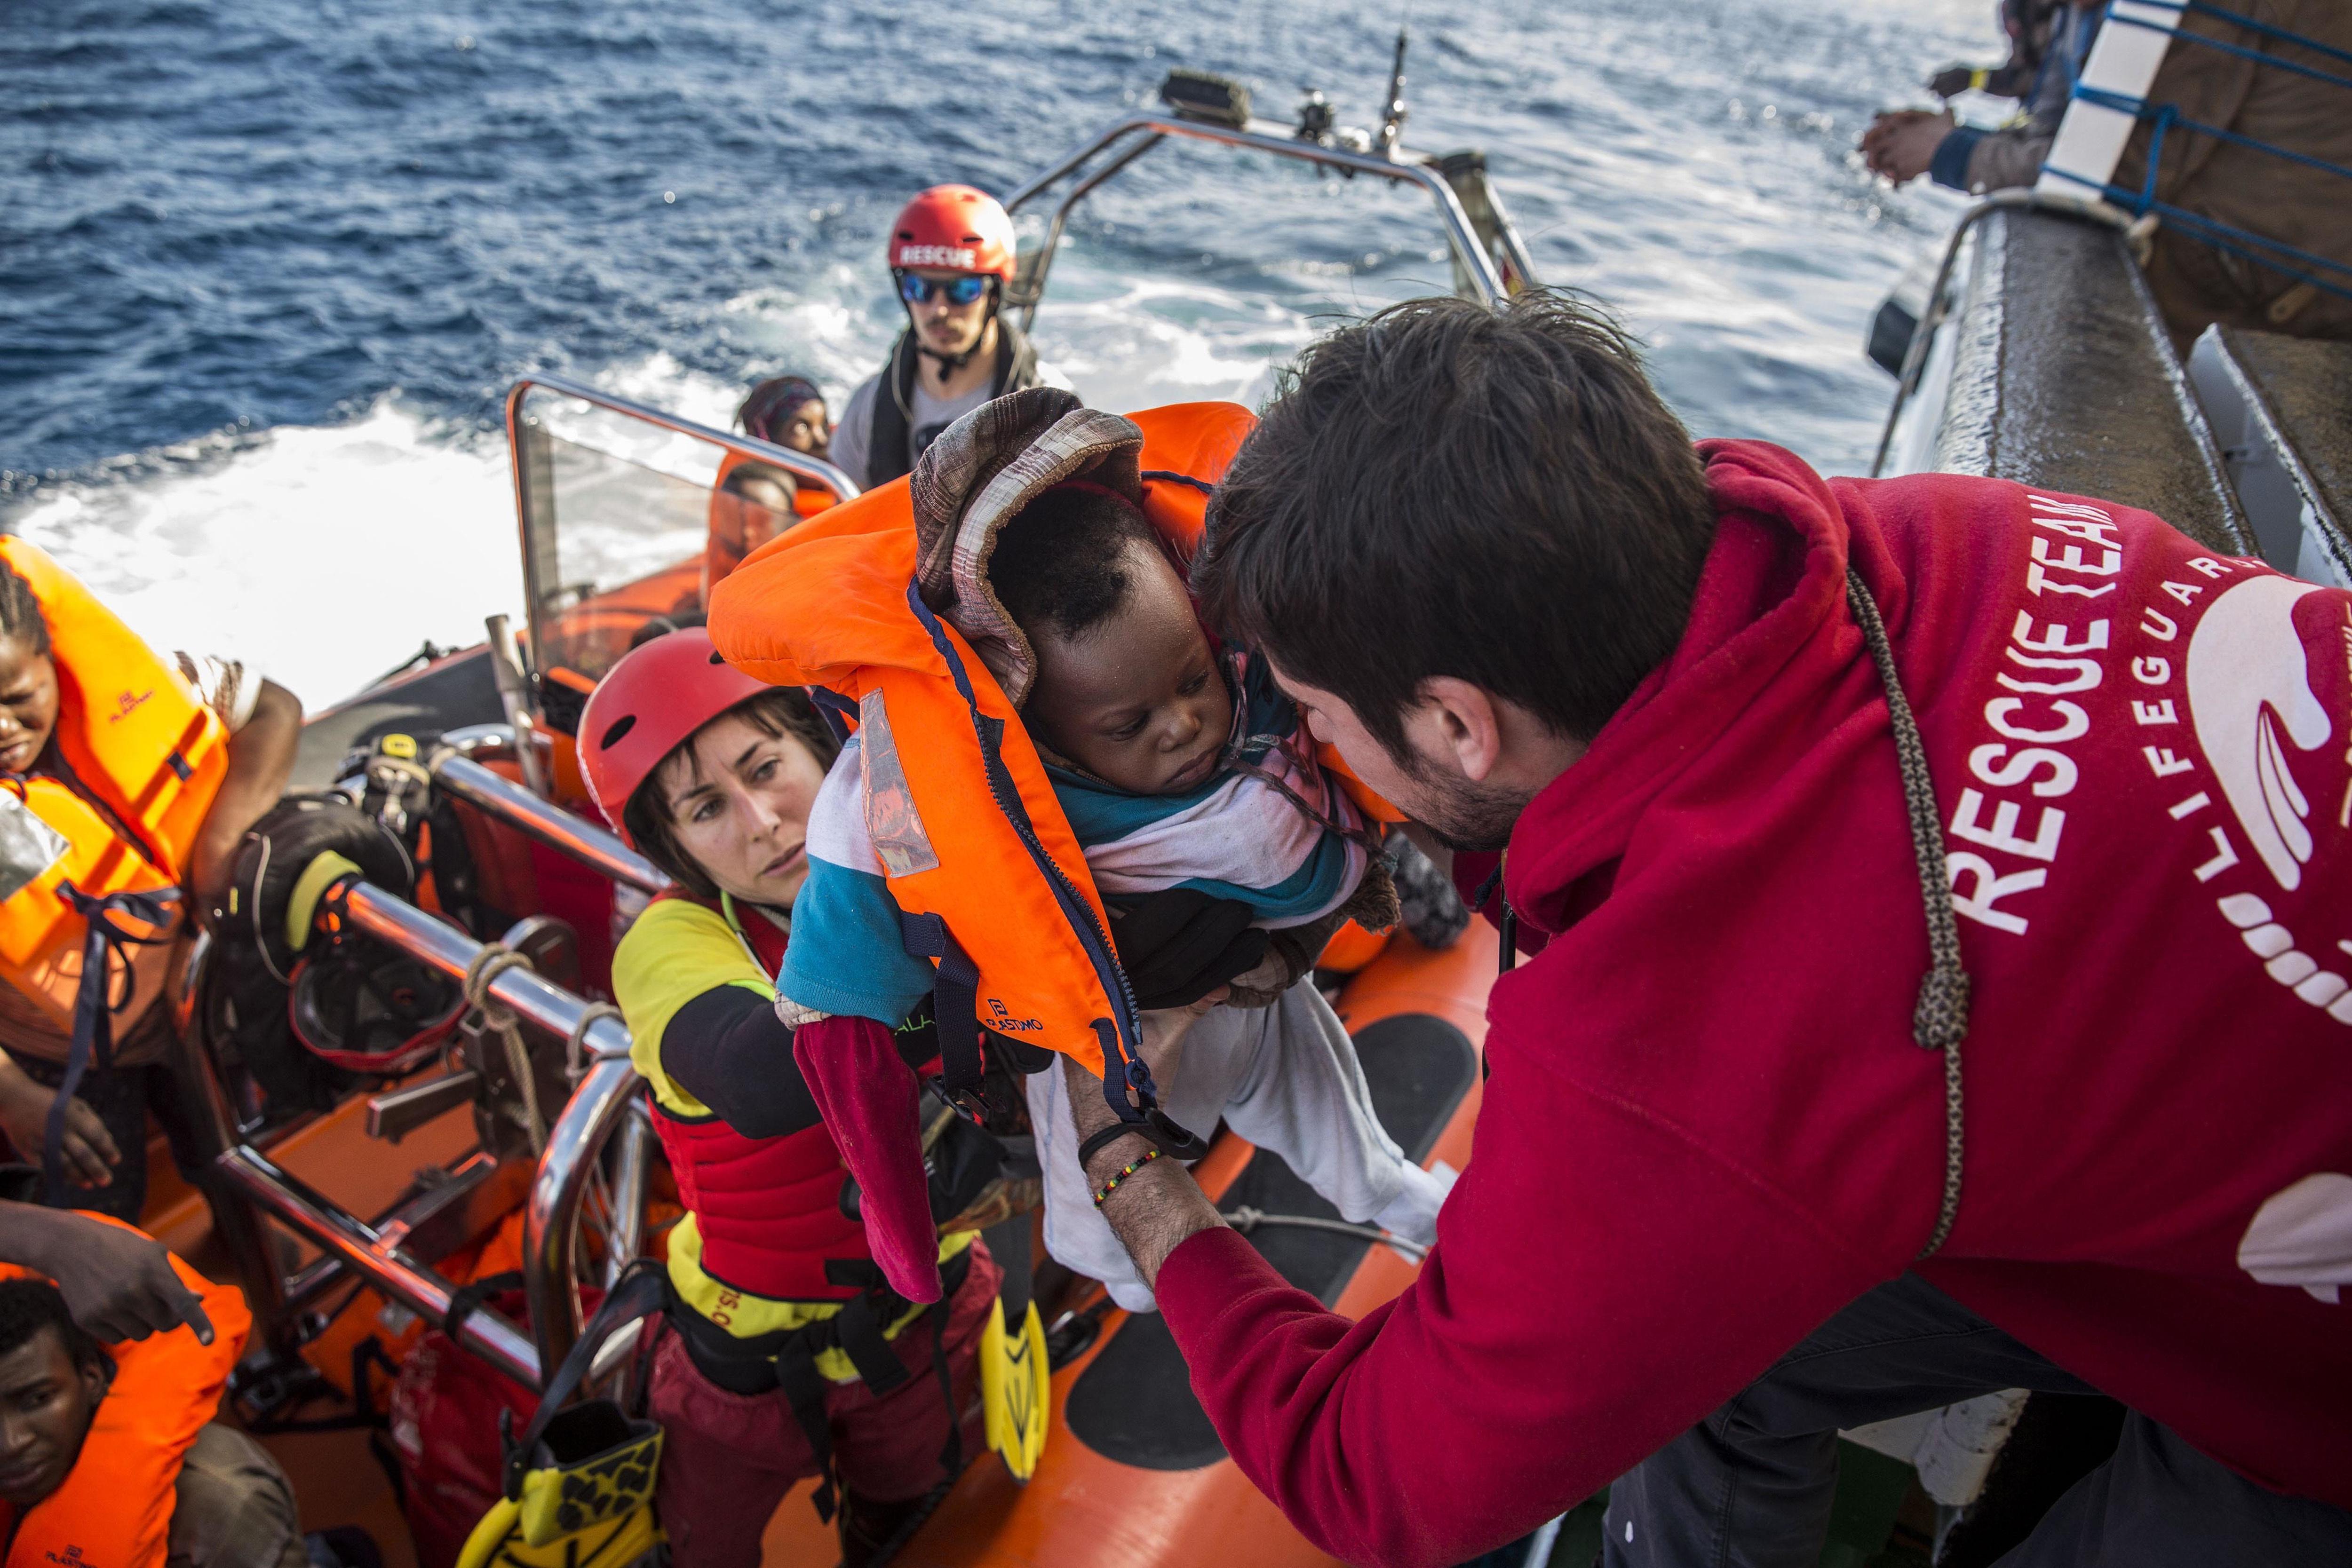 Libyan migrants fleeing civil war create new political waves in Europe